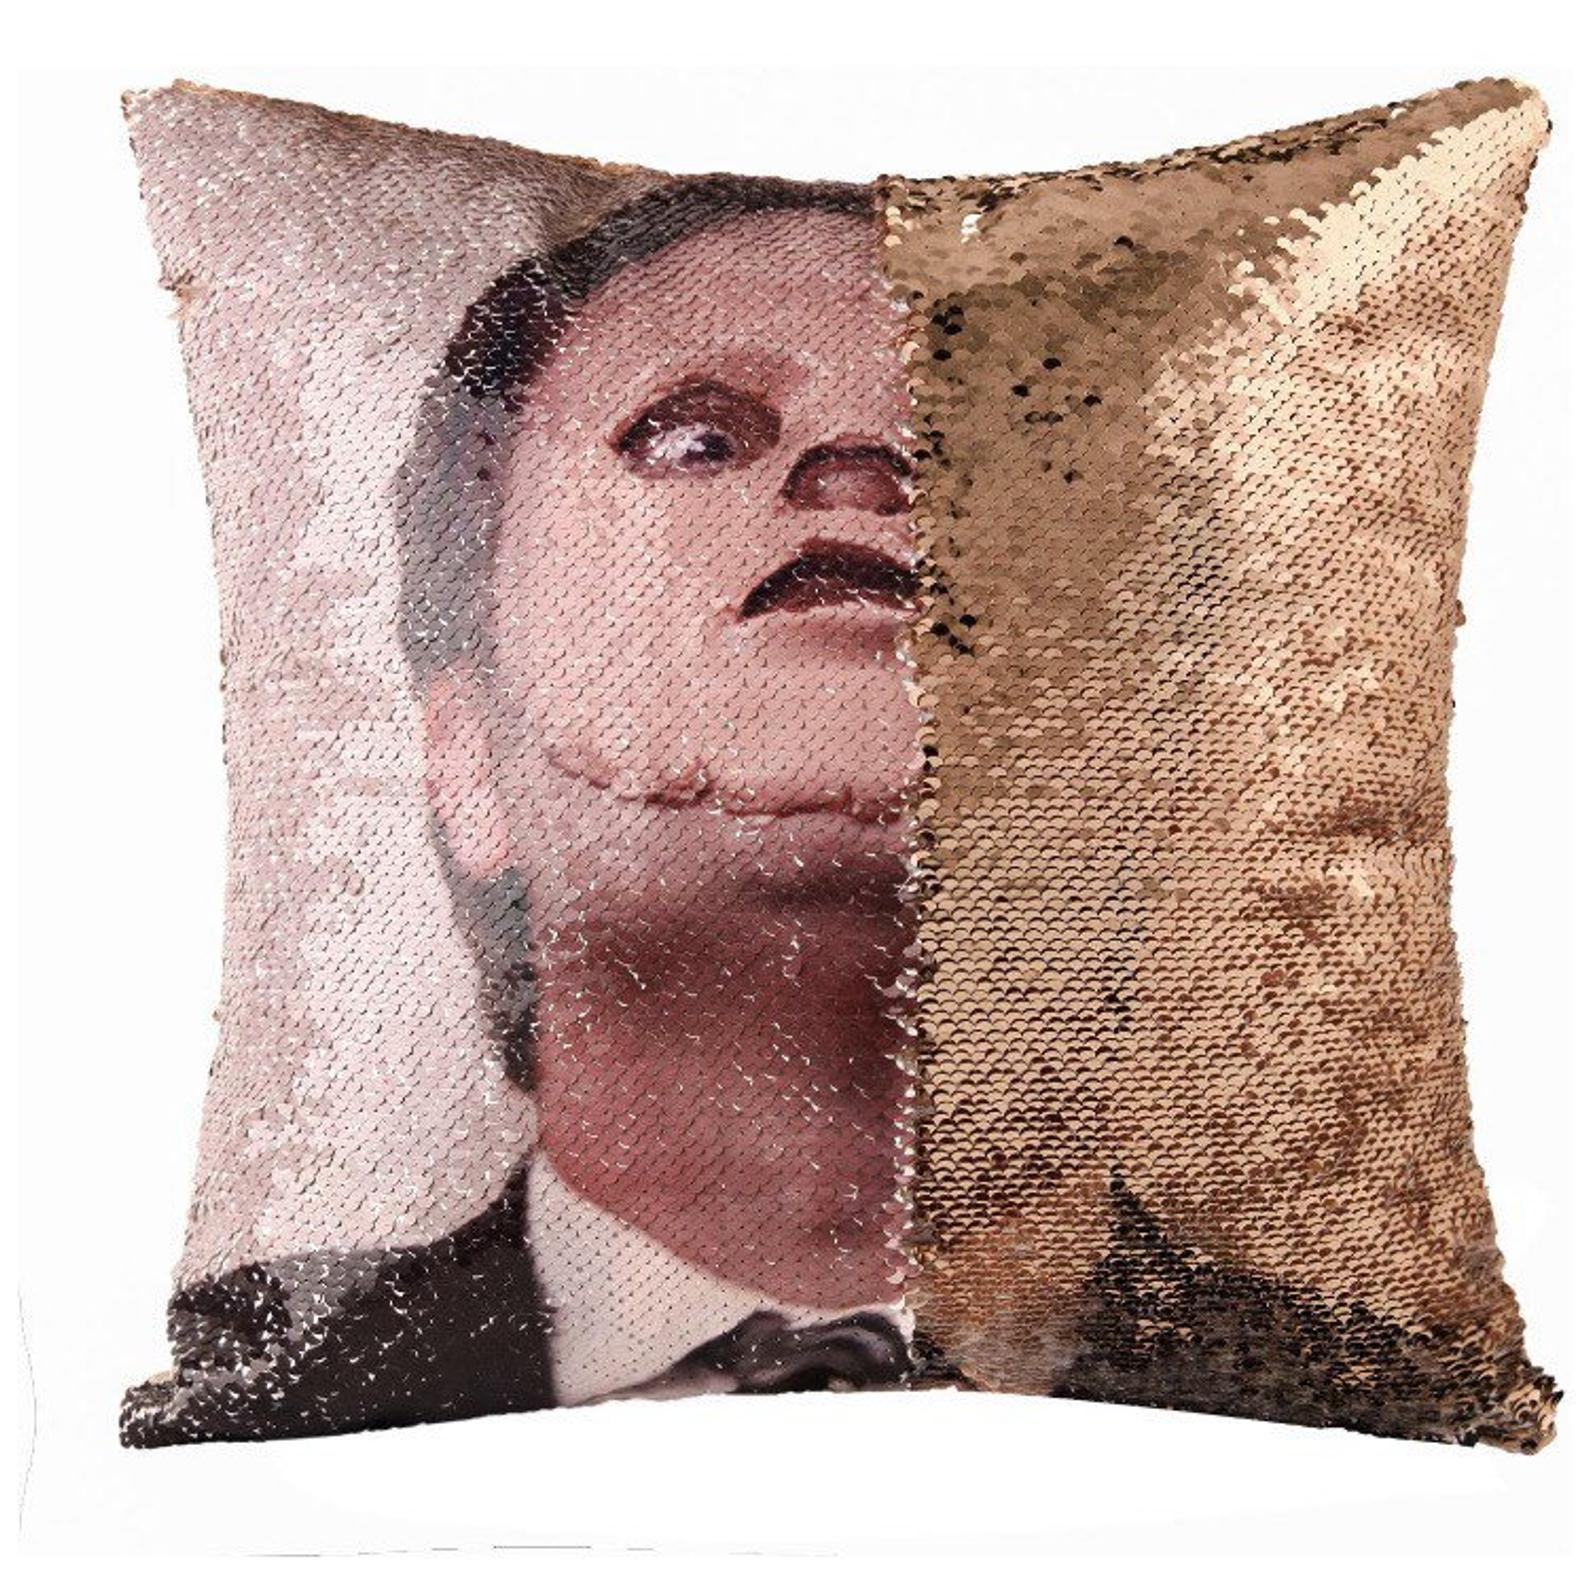 dwight schrute the mask sequin pillow